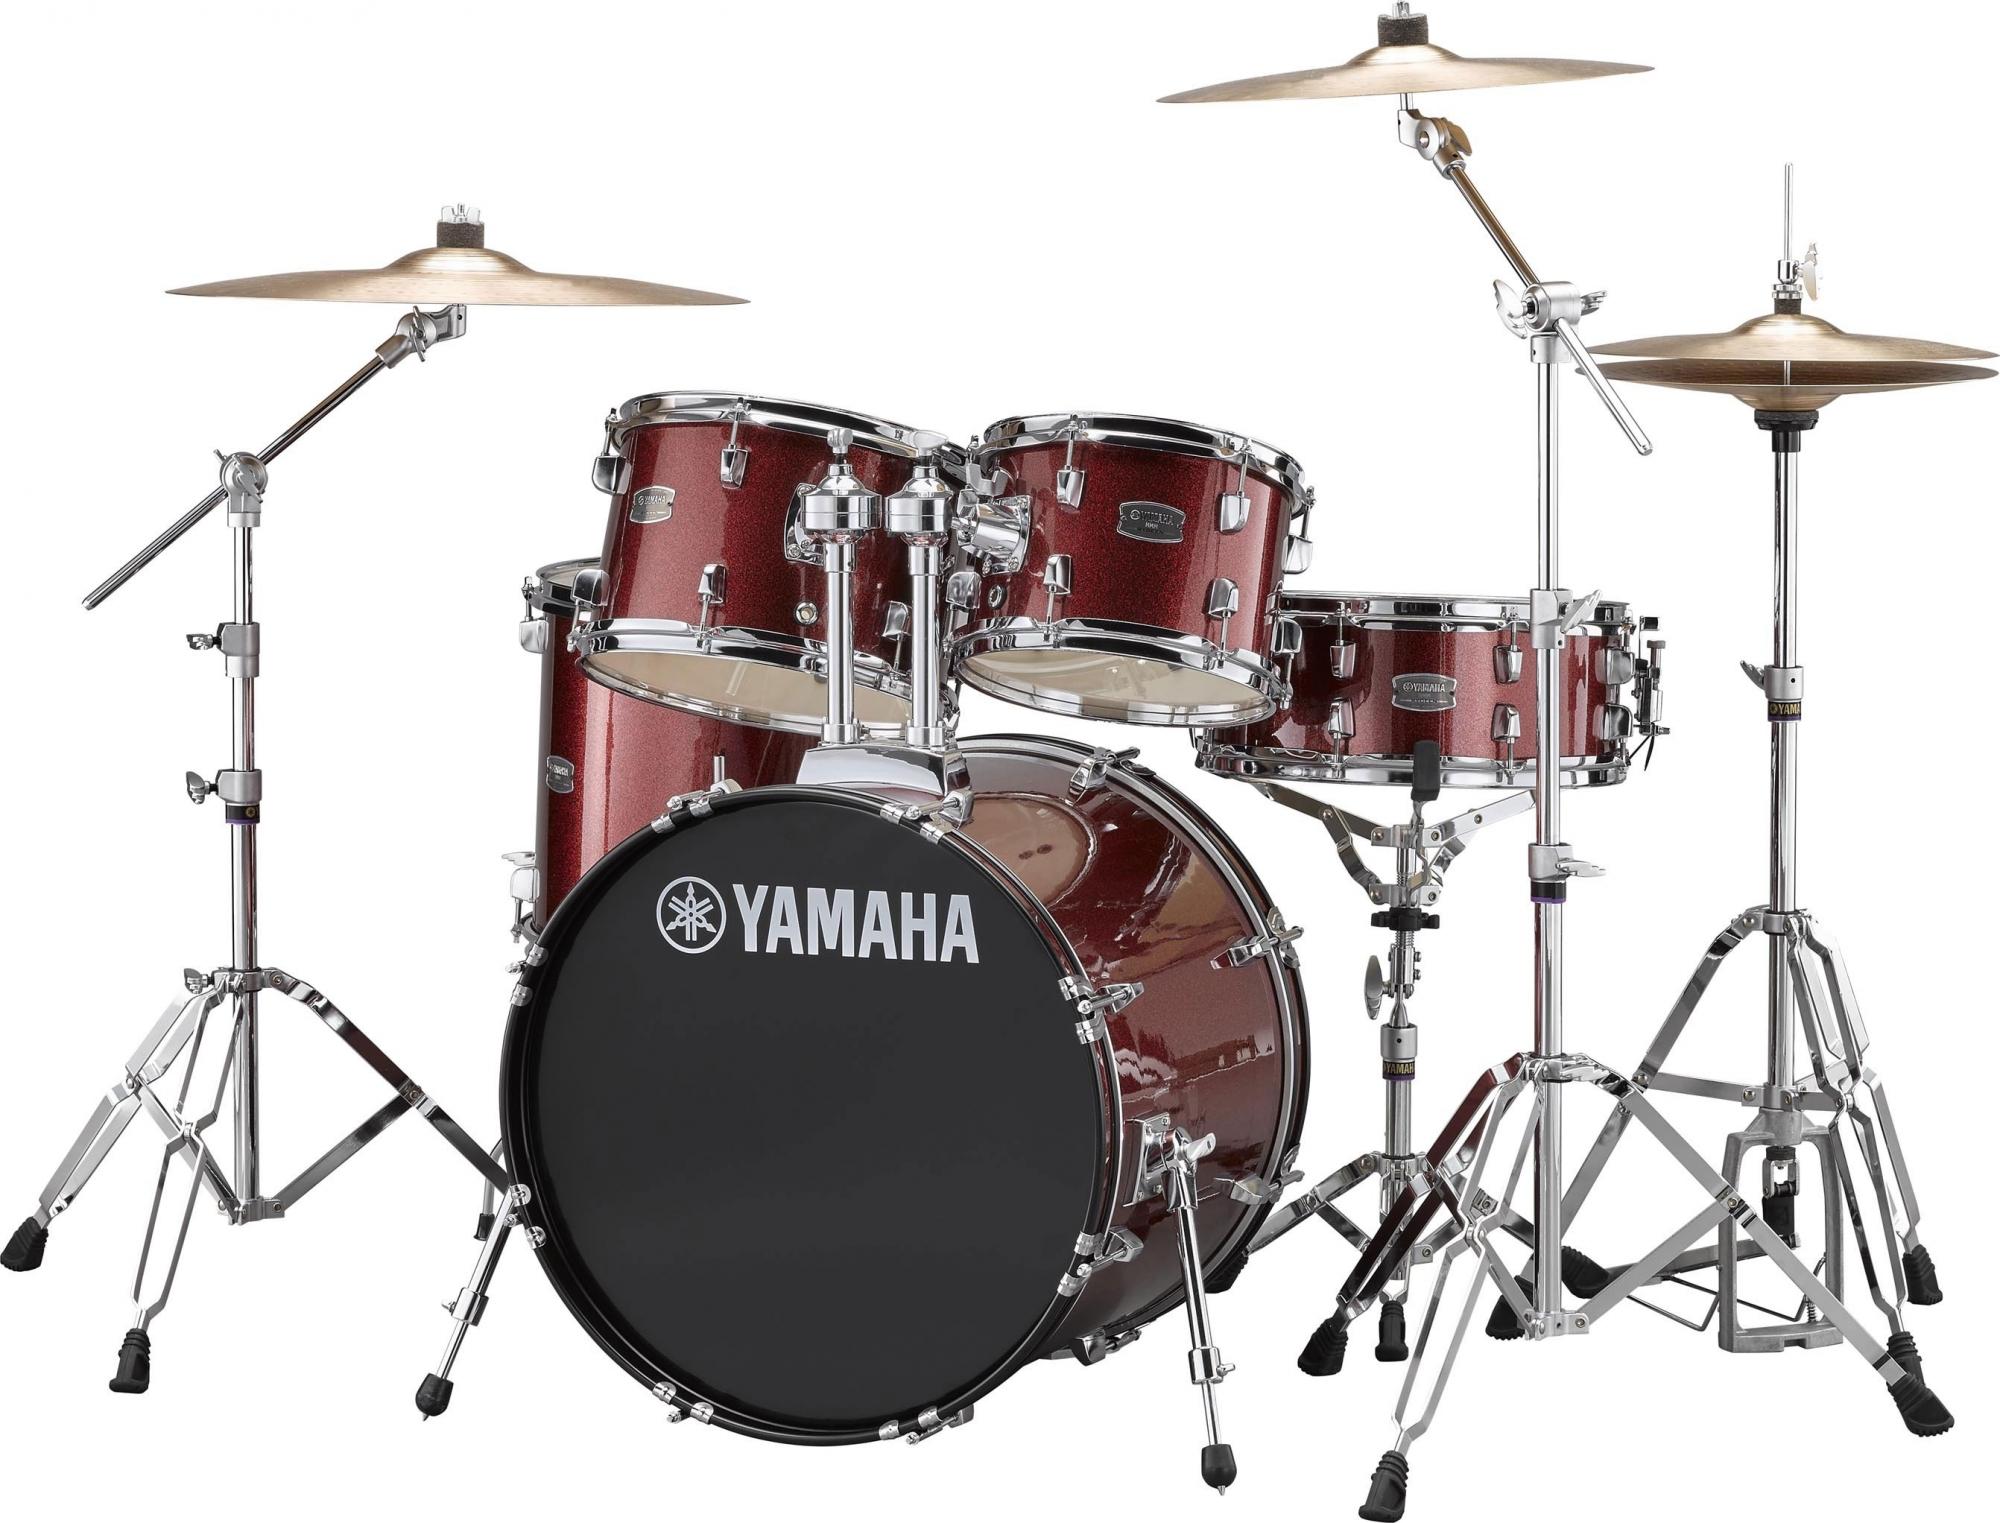 Yamaha RYDEEN Studio Trommesæt - inkl. bækkener & hardware Burgendy Glitter